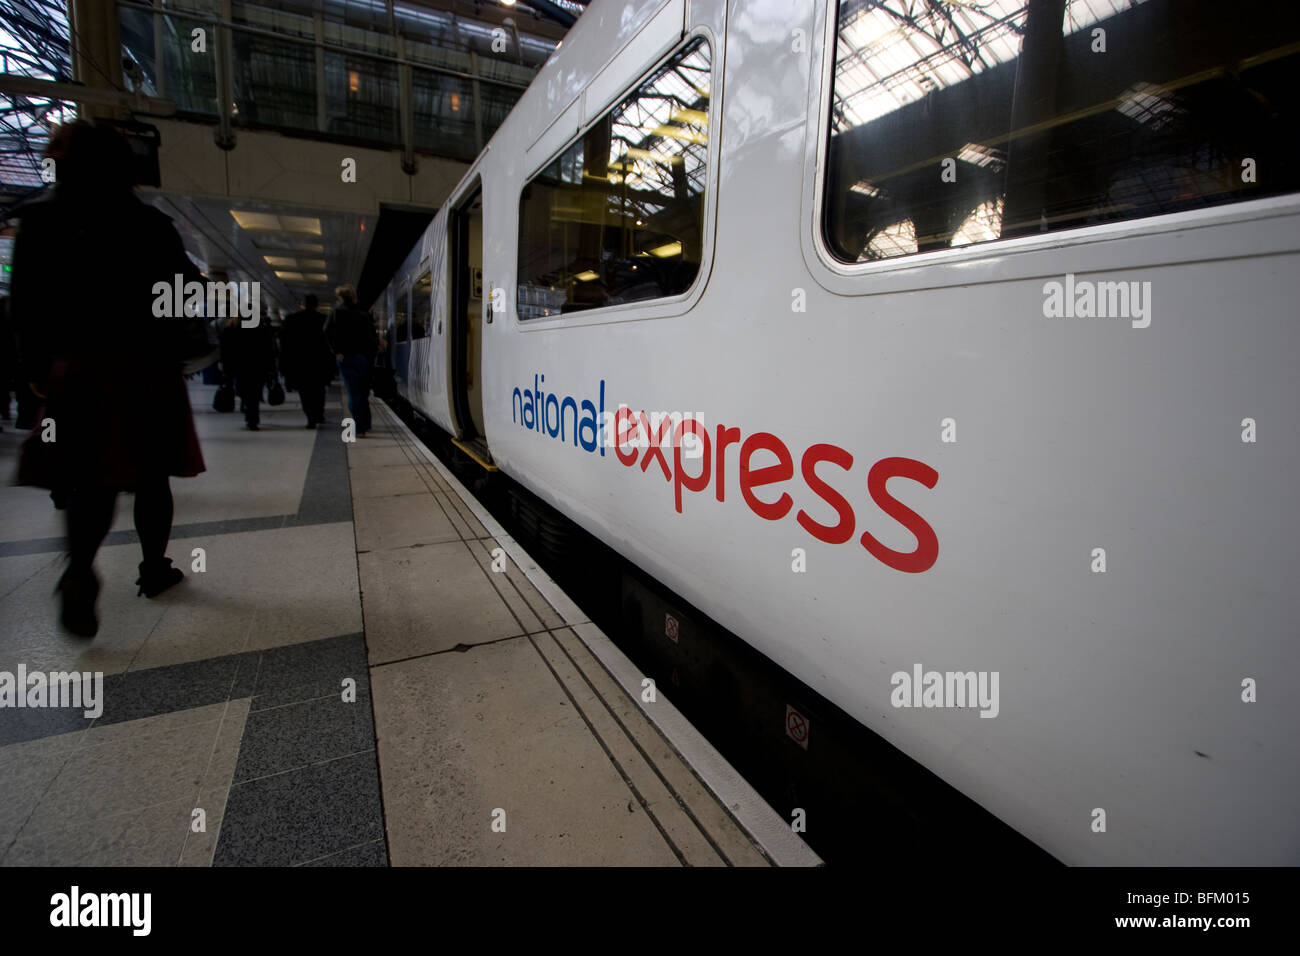 national express train on platform Liverpool street London - Stock Image